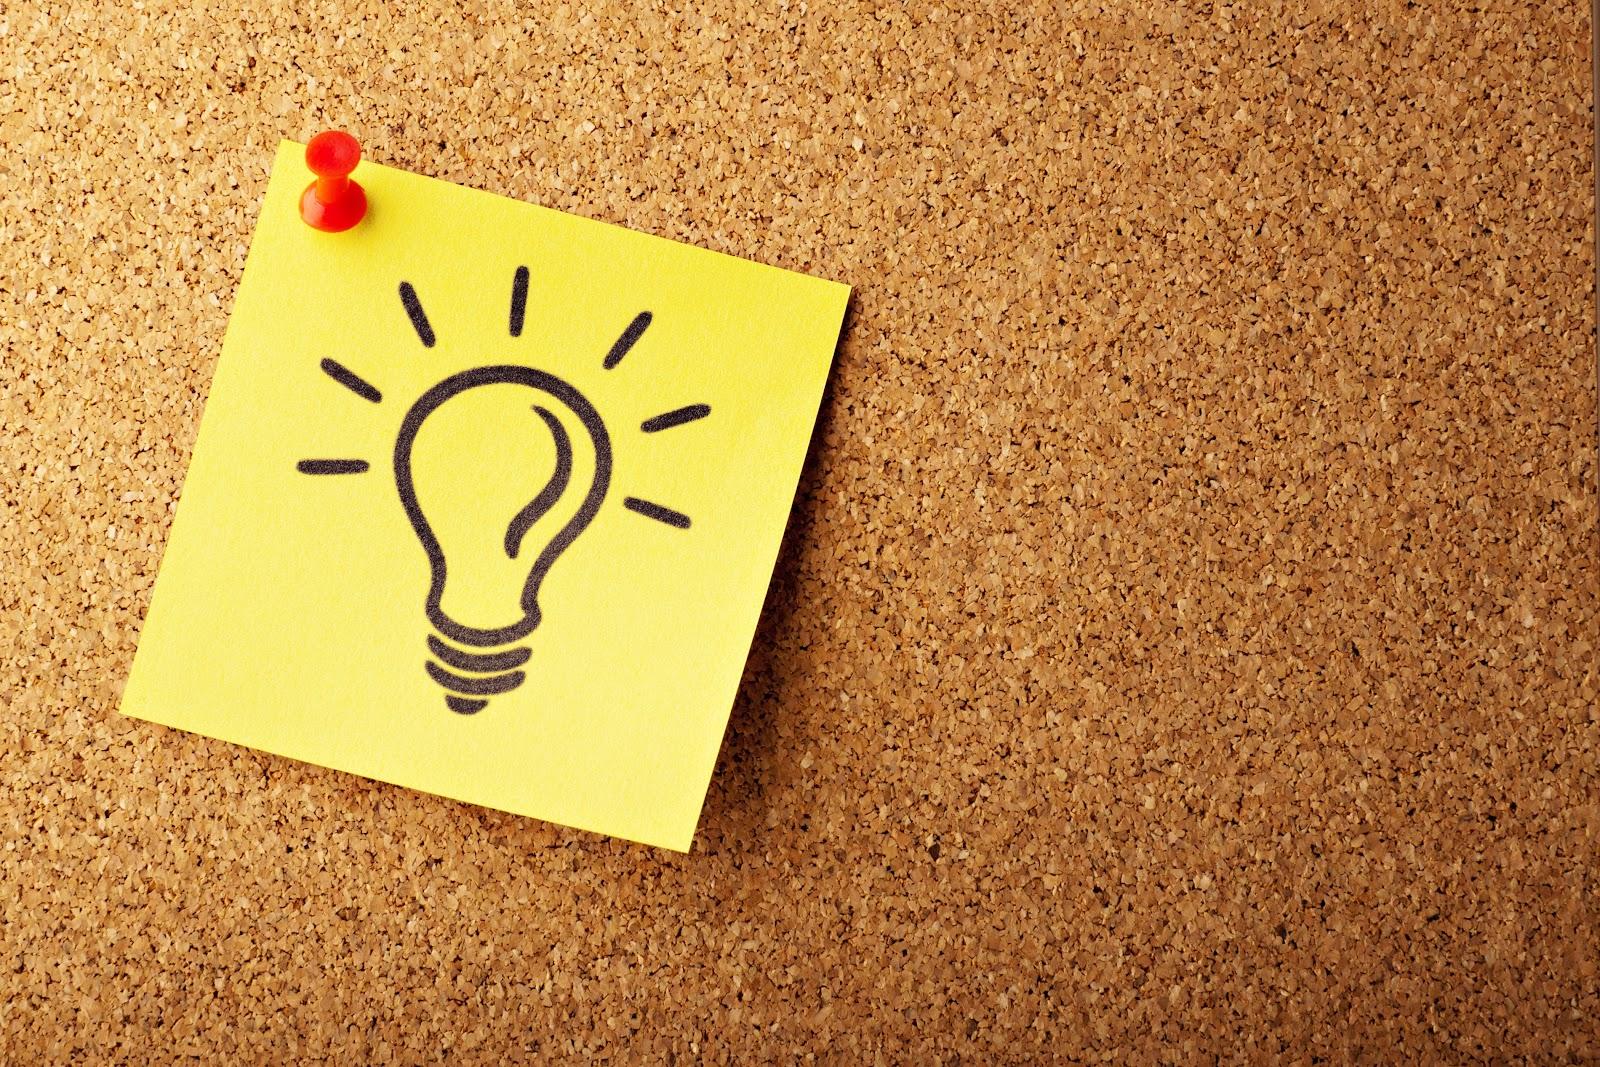 light bulb drawing on a sticky note